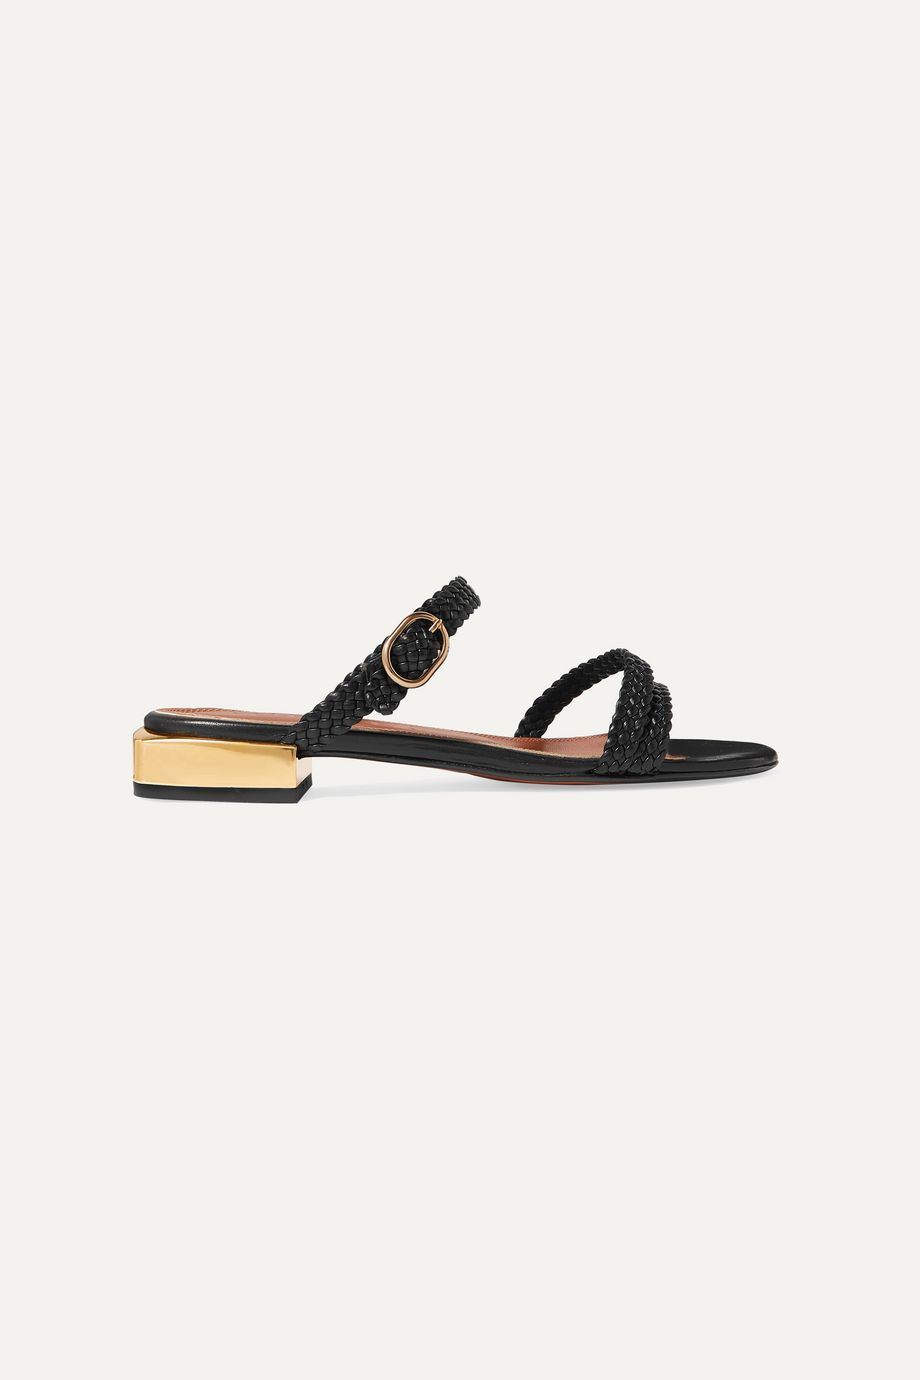 Souliers Martinez Granada woven leather sandals